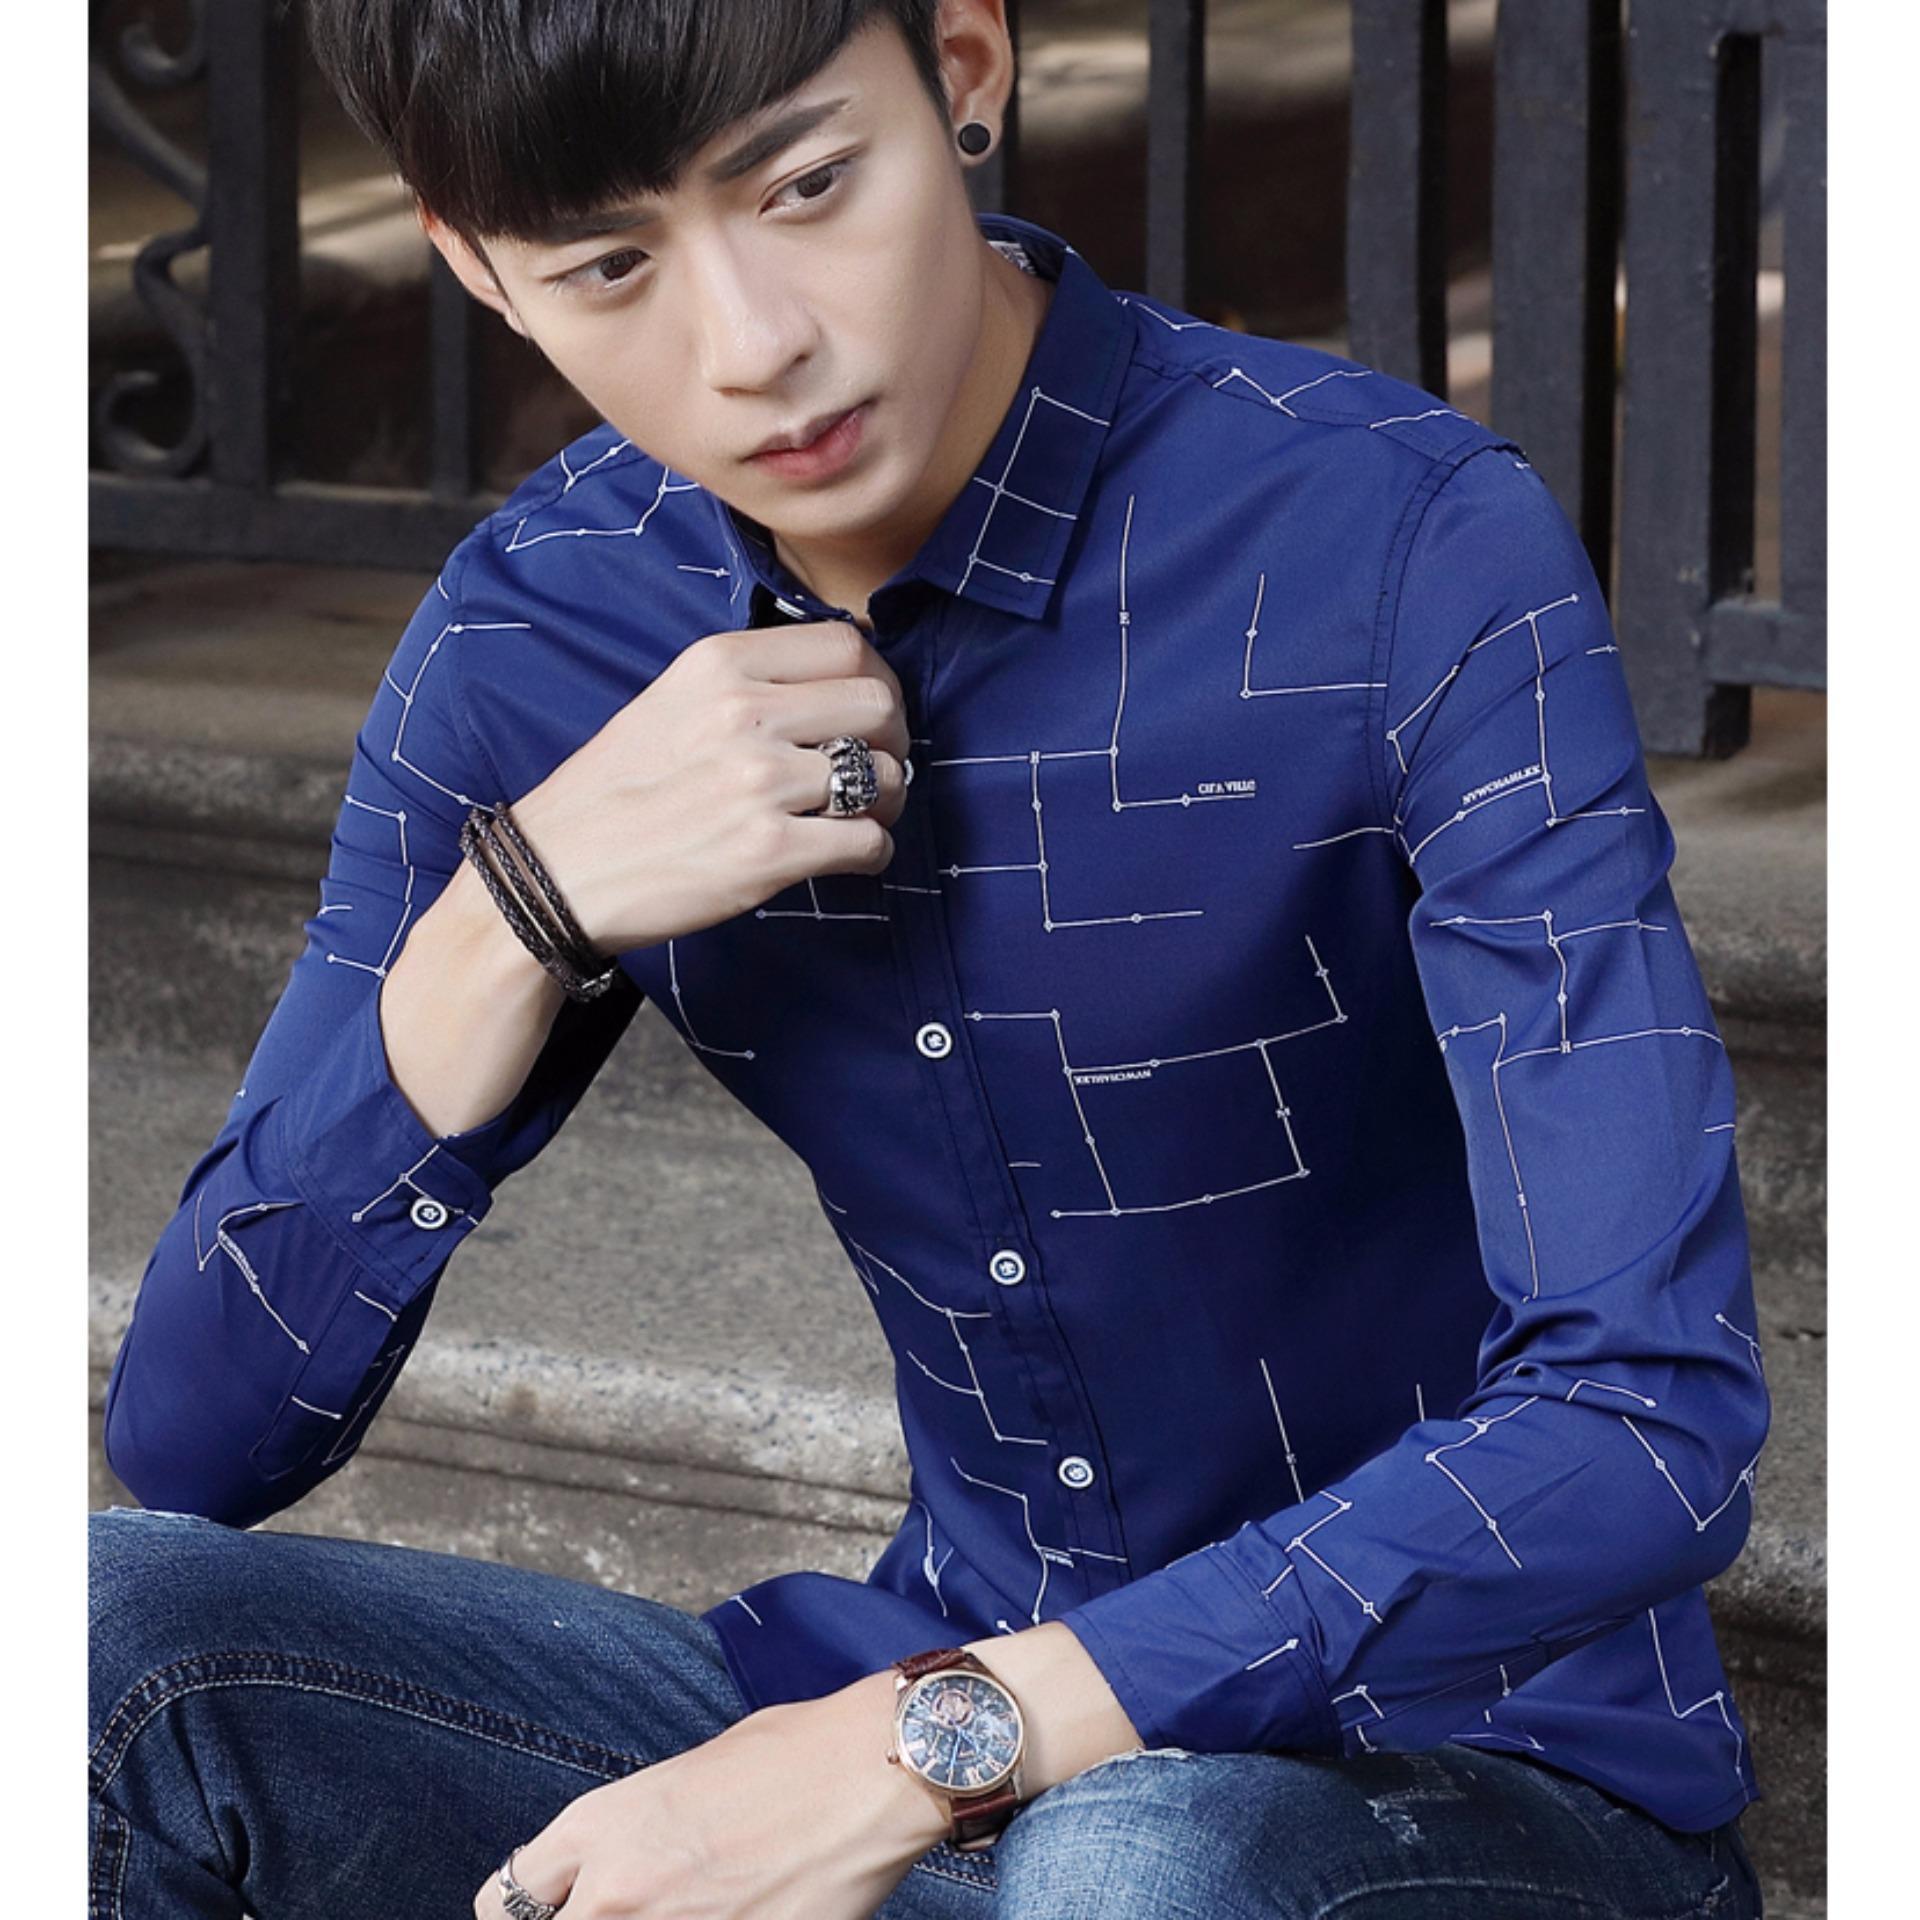 Korea Pria Lengan Pendek Katun Kasual Kerja Kemeja Button Downputih Hem Batik Hks001 03 Geometri Baju Panjang Pesta Berkancing Biru